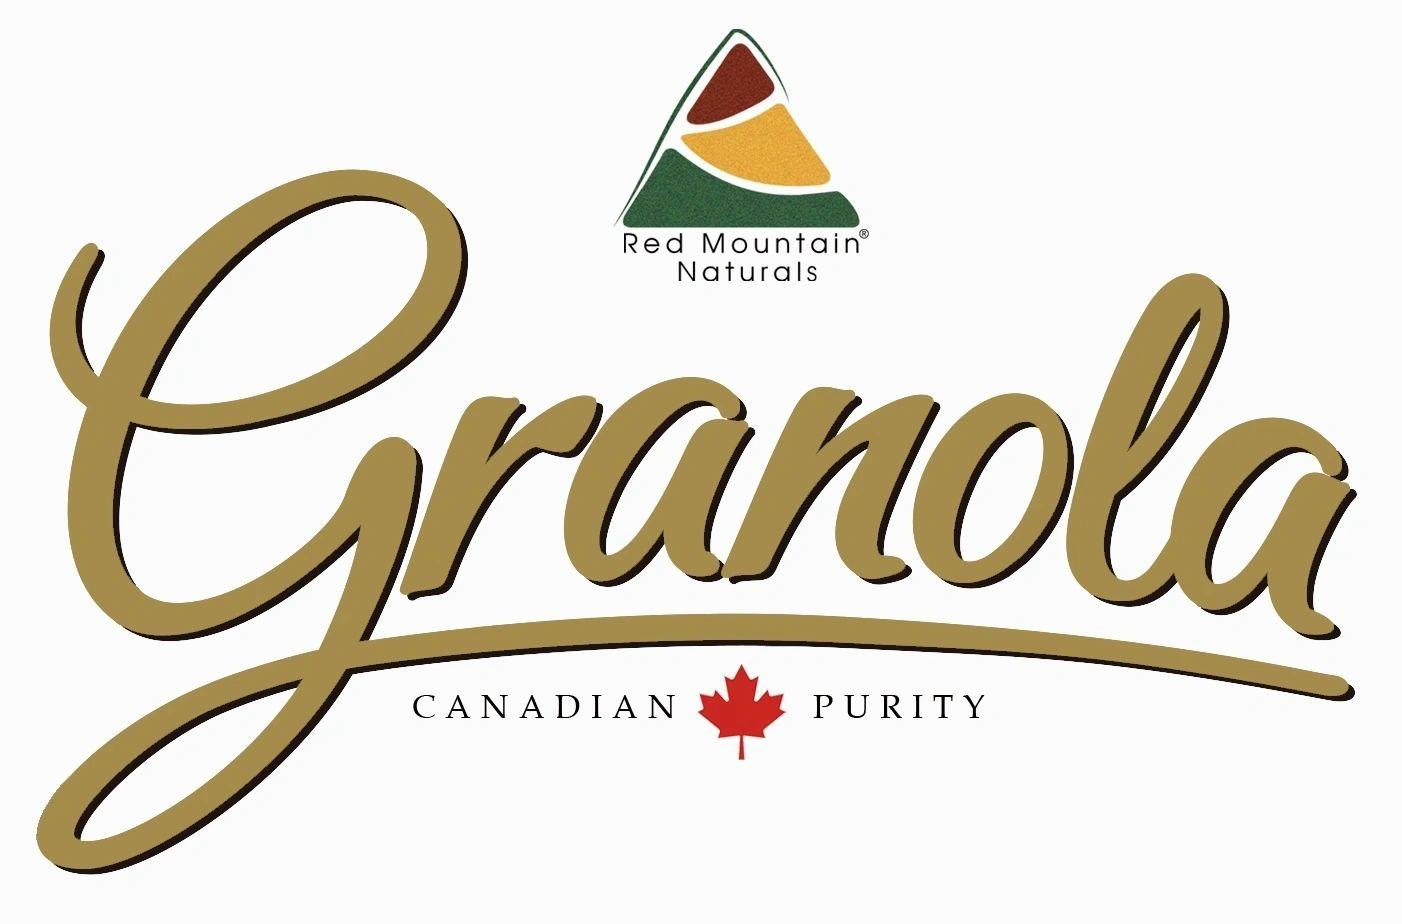 Red Mountain Naturals Granola logo